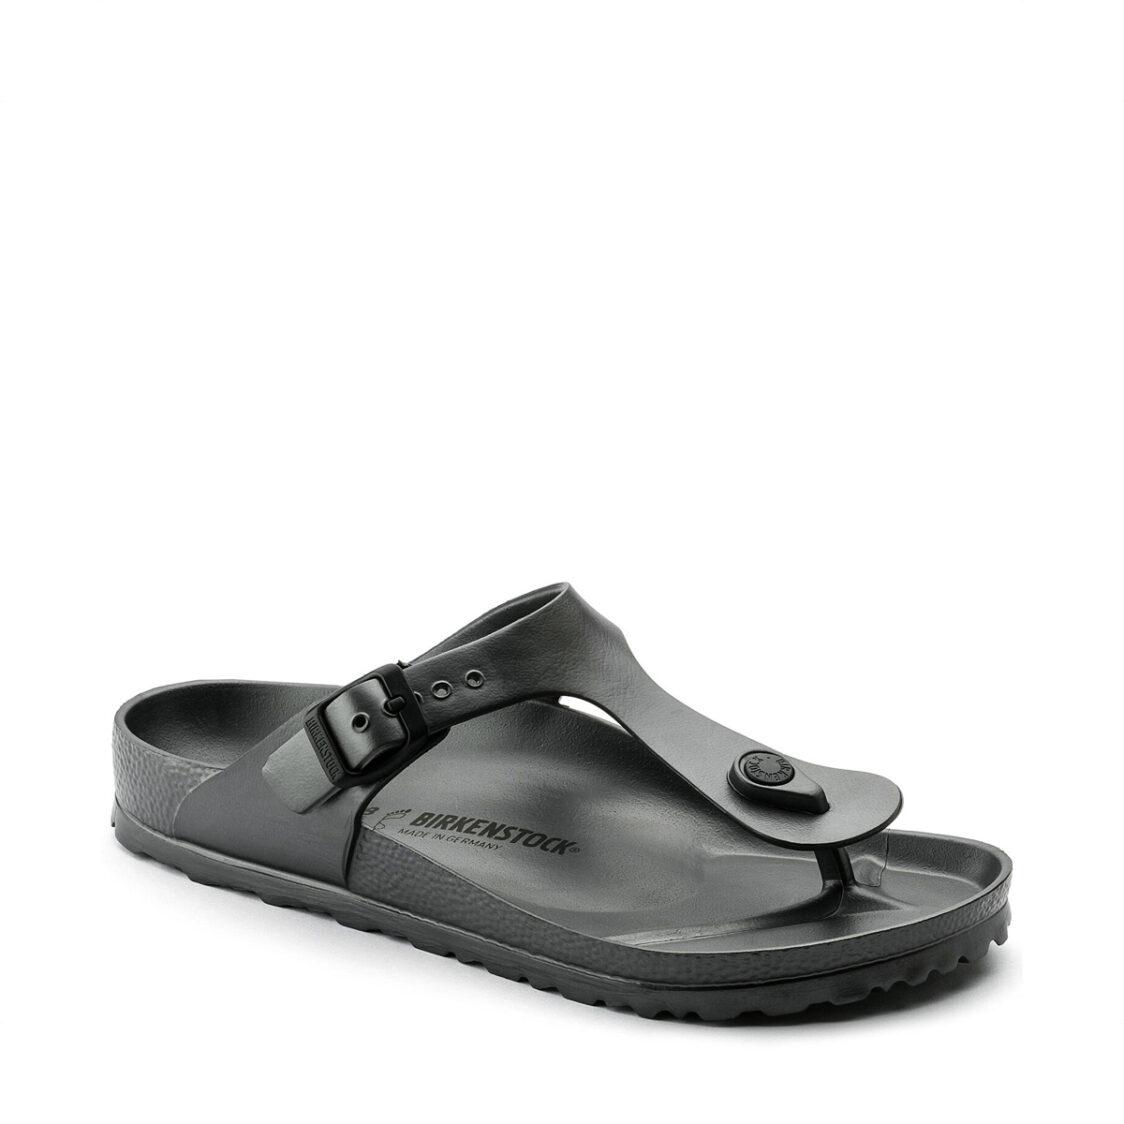 Birkenstock Gizeh EVA Unisex Regular Width Sandals Anthracite